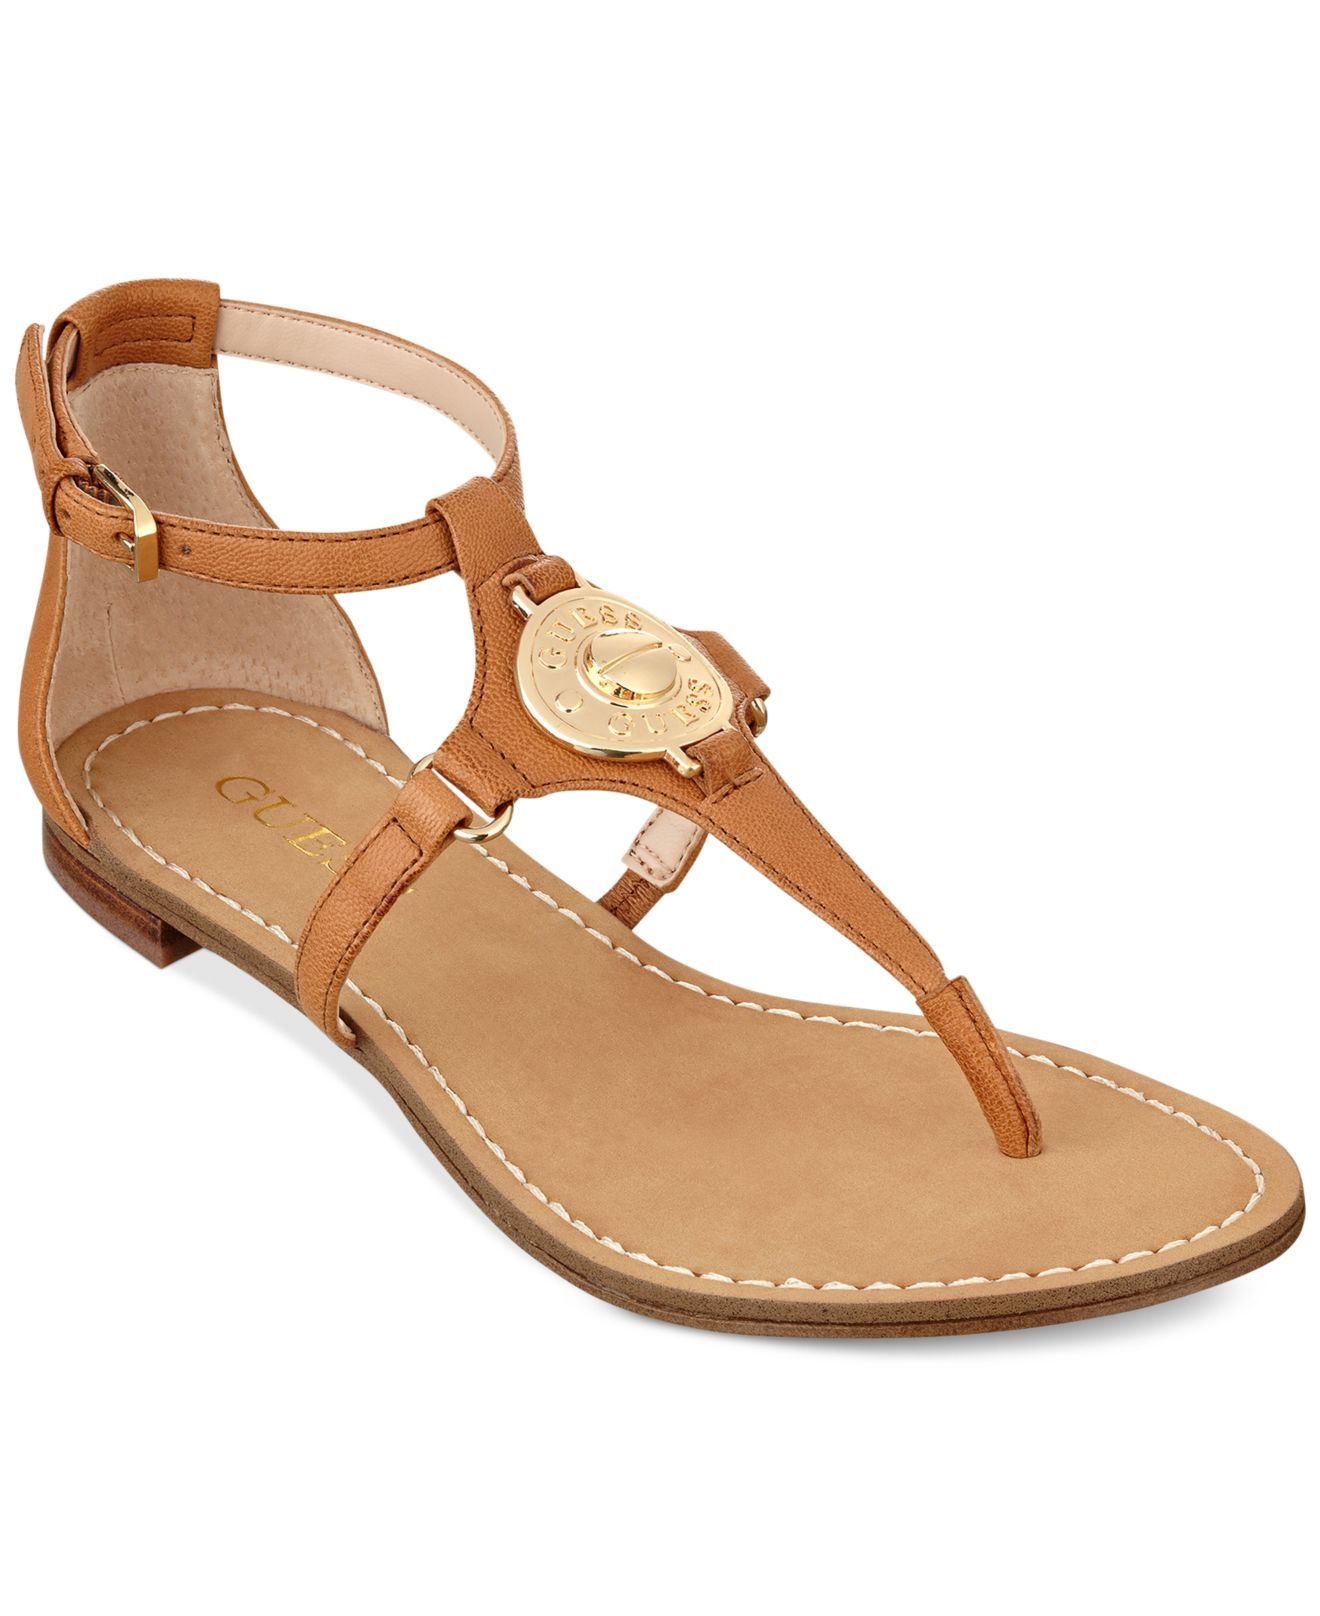 Perfect New GUESS Womens Romper BLACK Sneaker Sandals Shoes 7 New GUESS Womens Romper BLACK Sneaker Sandals Shoes 9 New GUESS Womens Romper BLACK Sneaker Sandals Shoes 8 New GUESS Womens